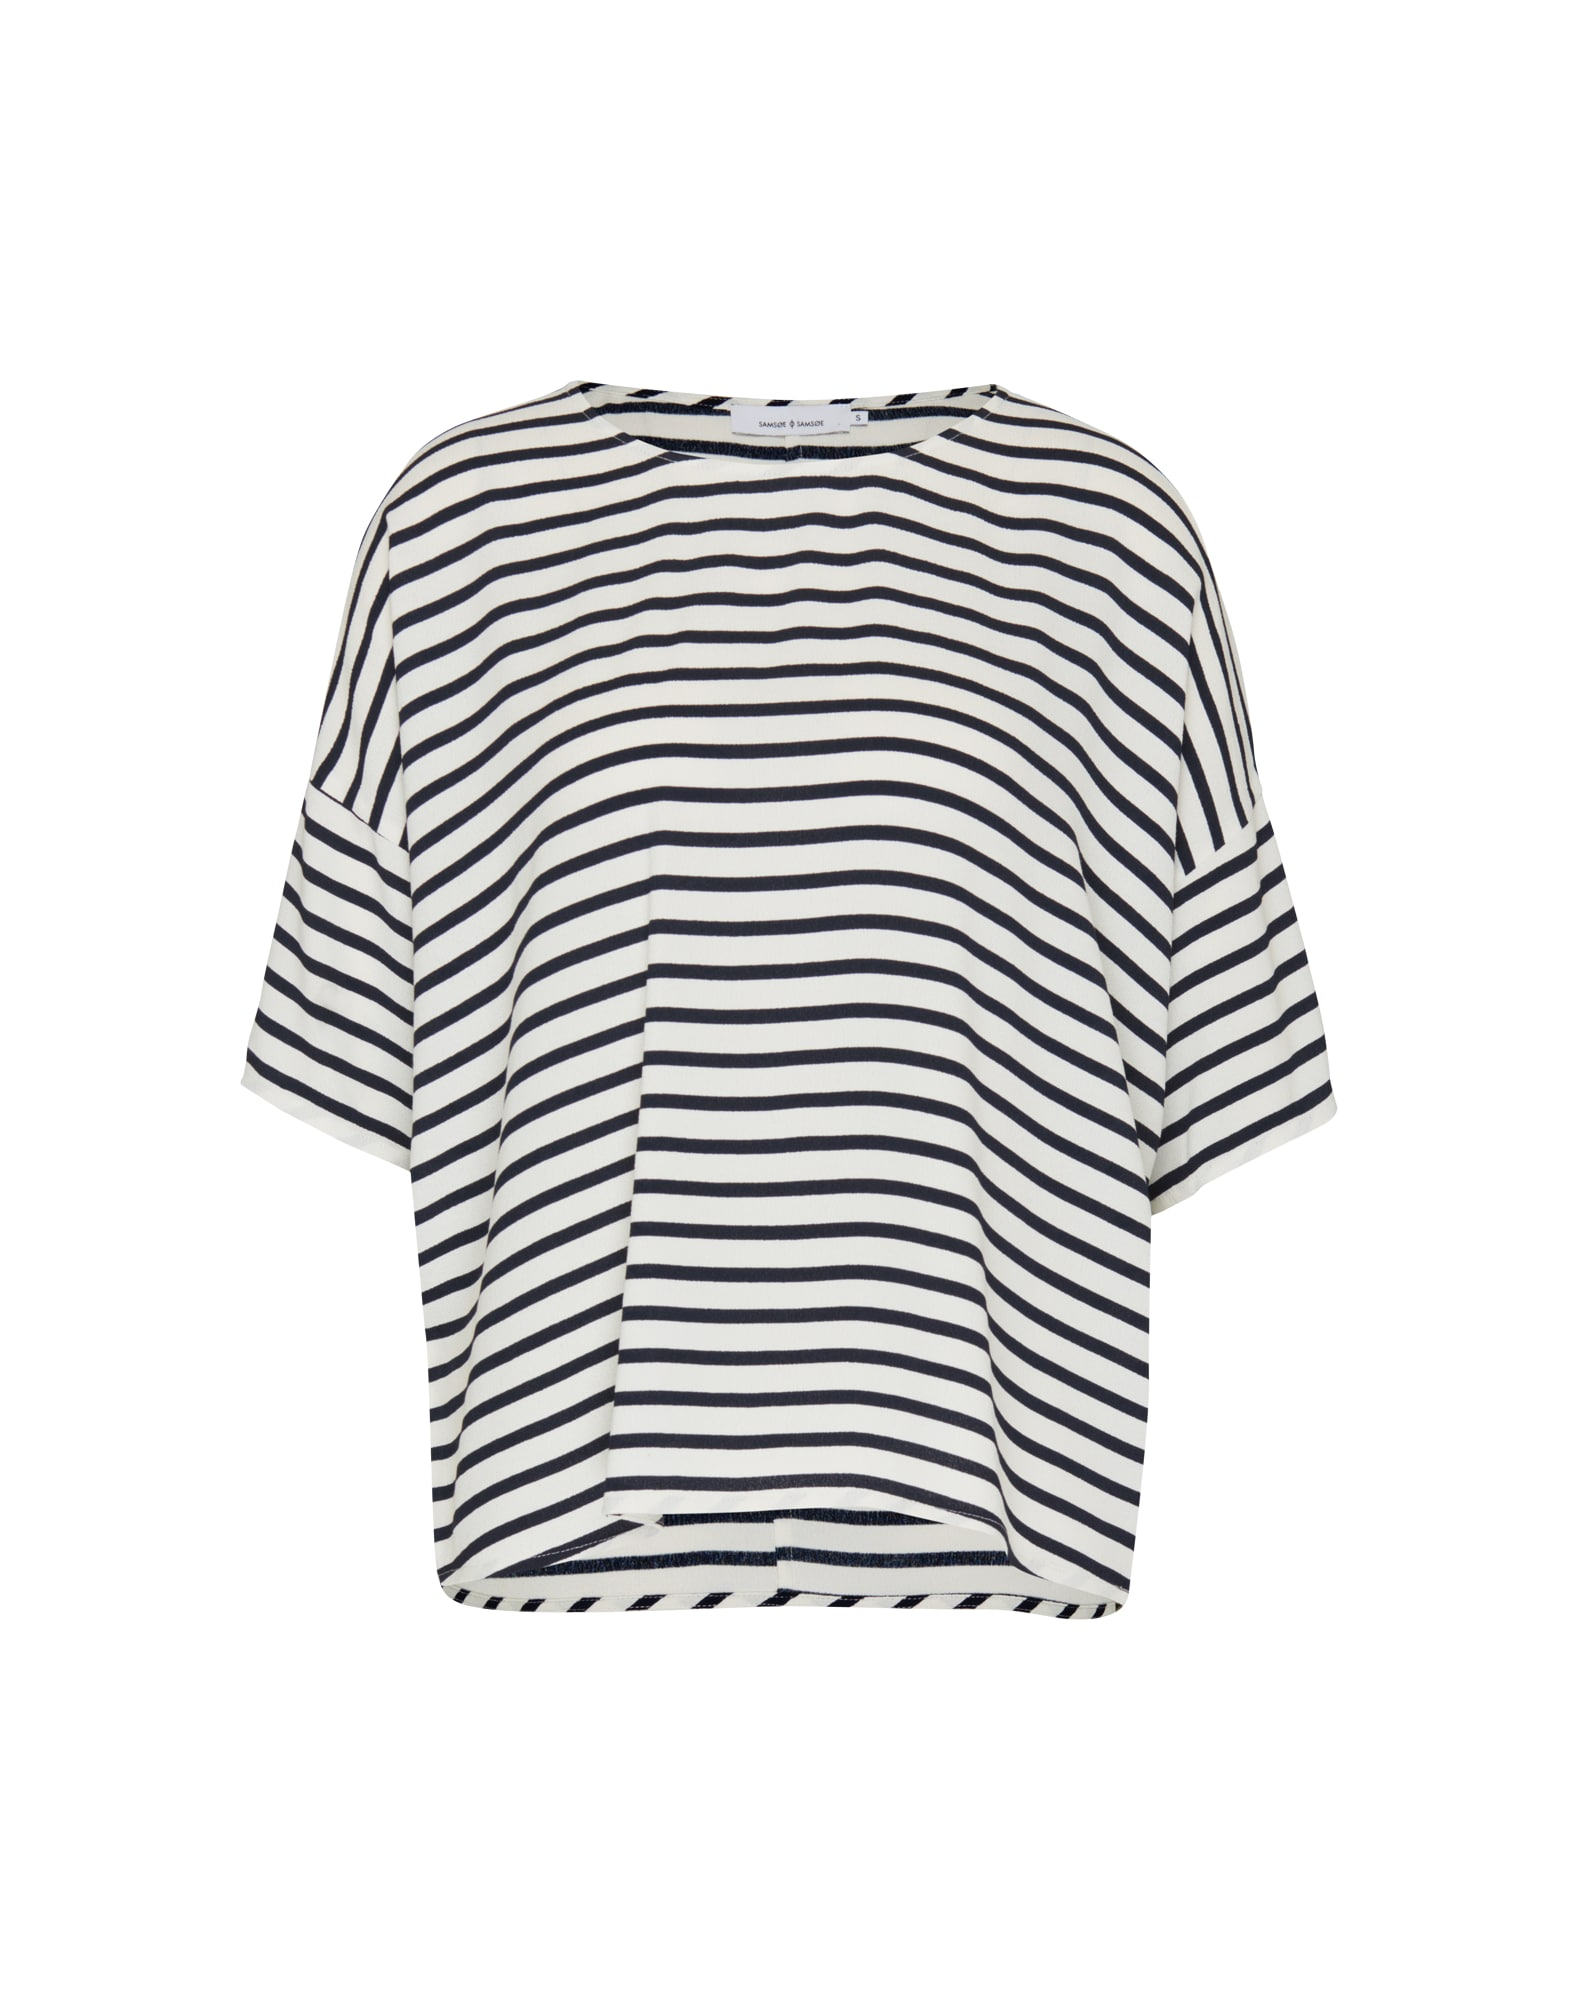 Tričko námořnická modř bílá Samsoe & Samsoe